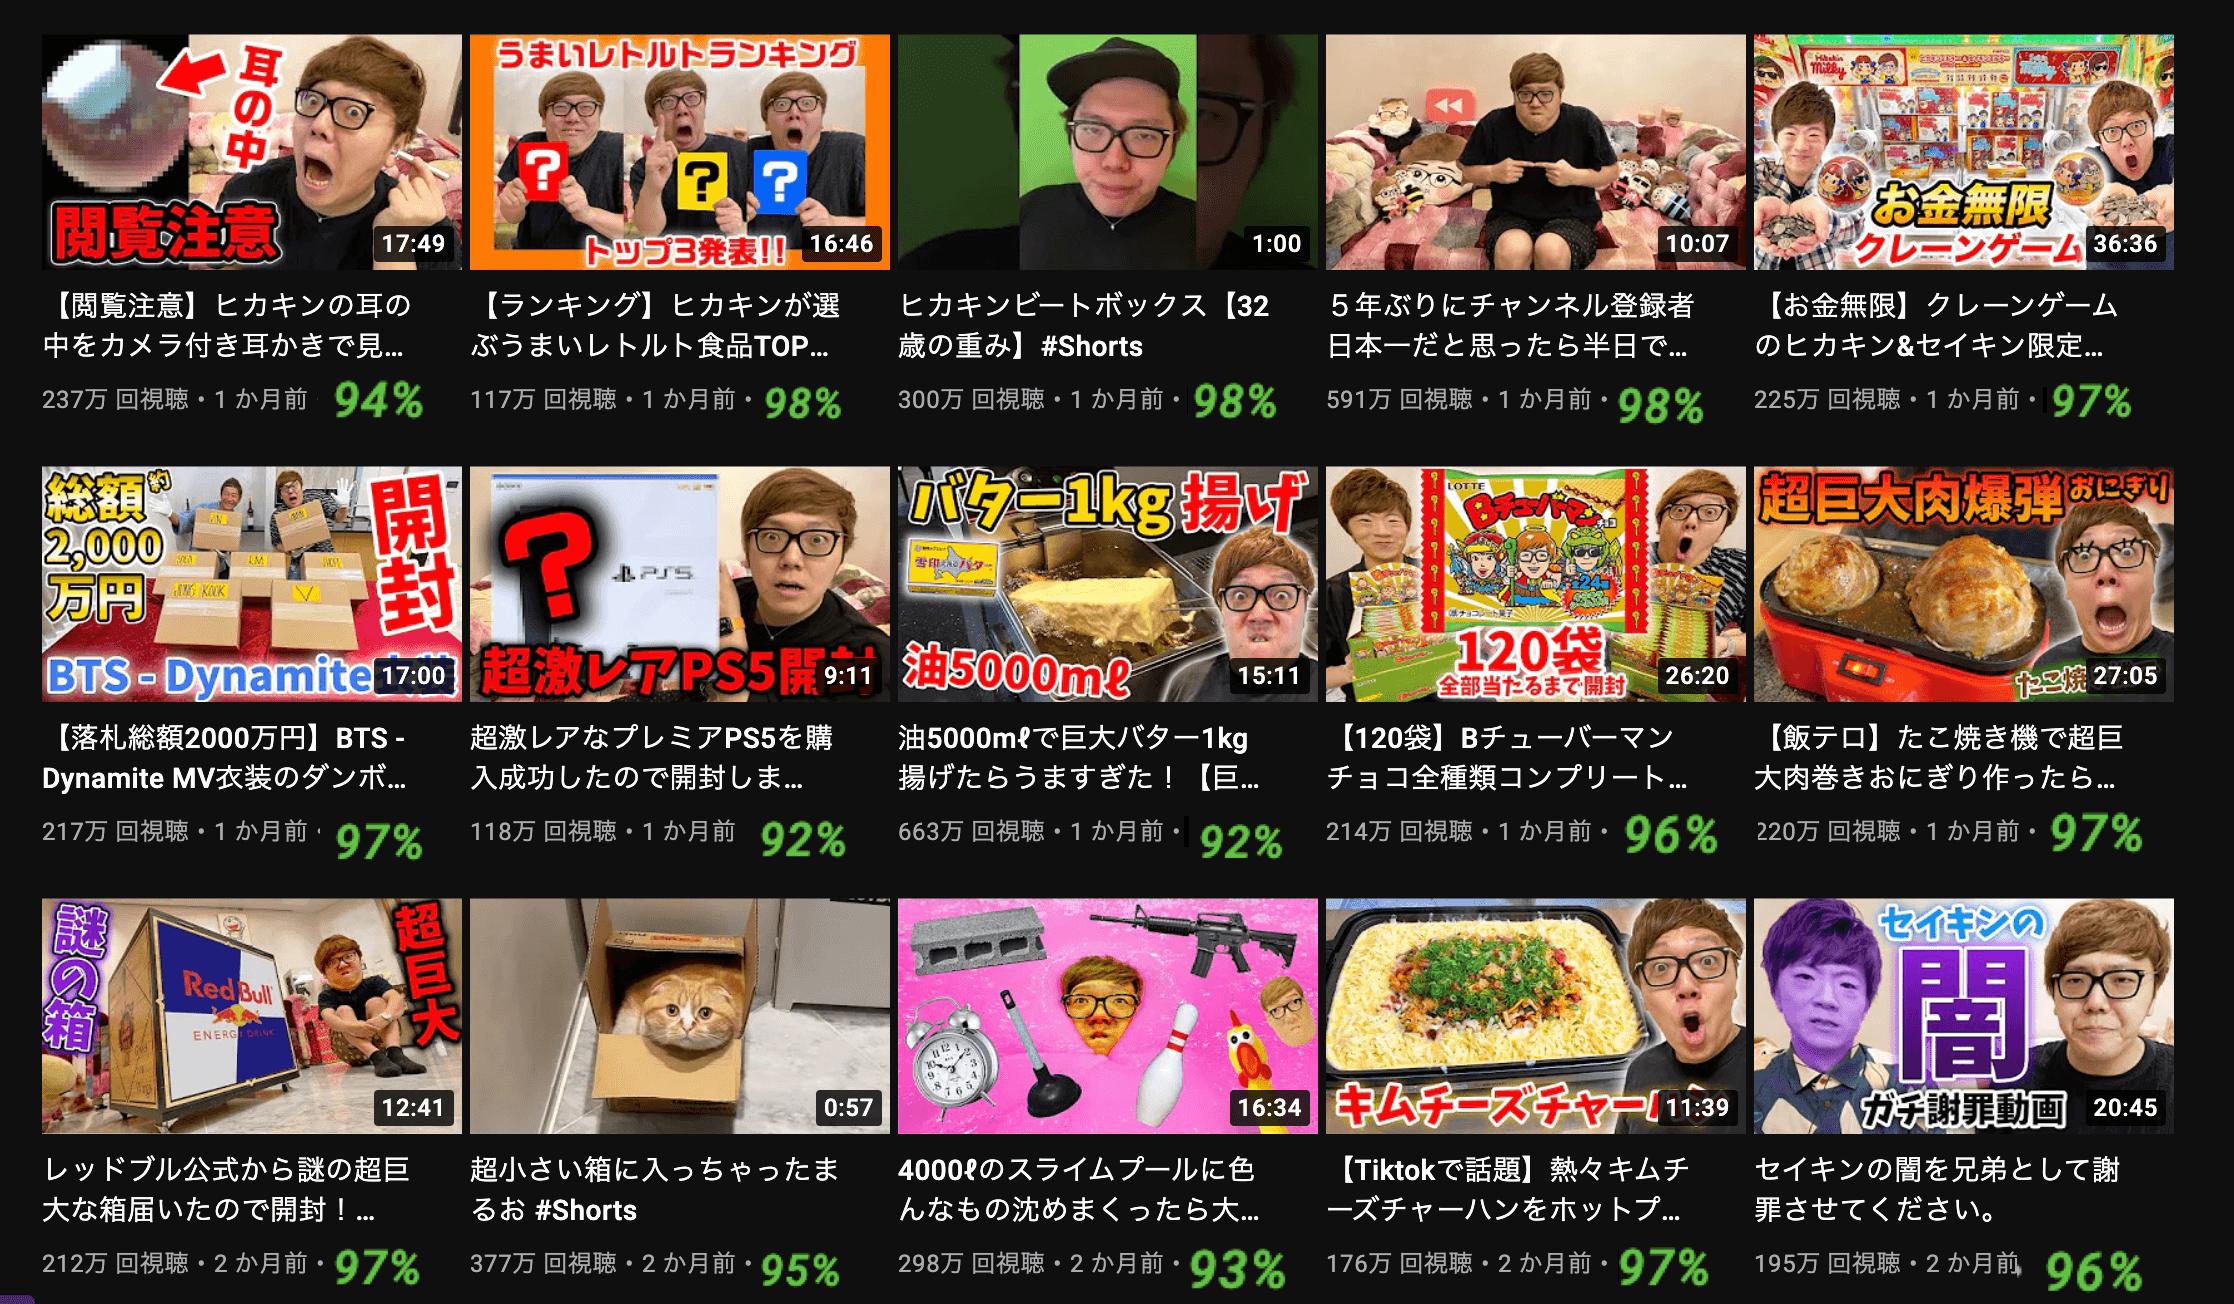 youtube-hikakin-reputation